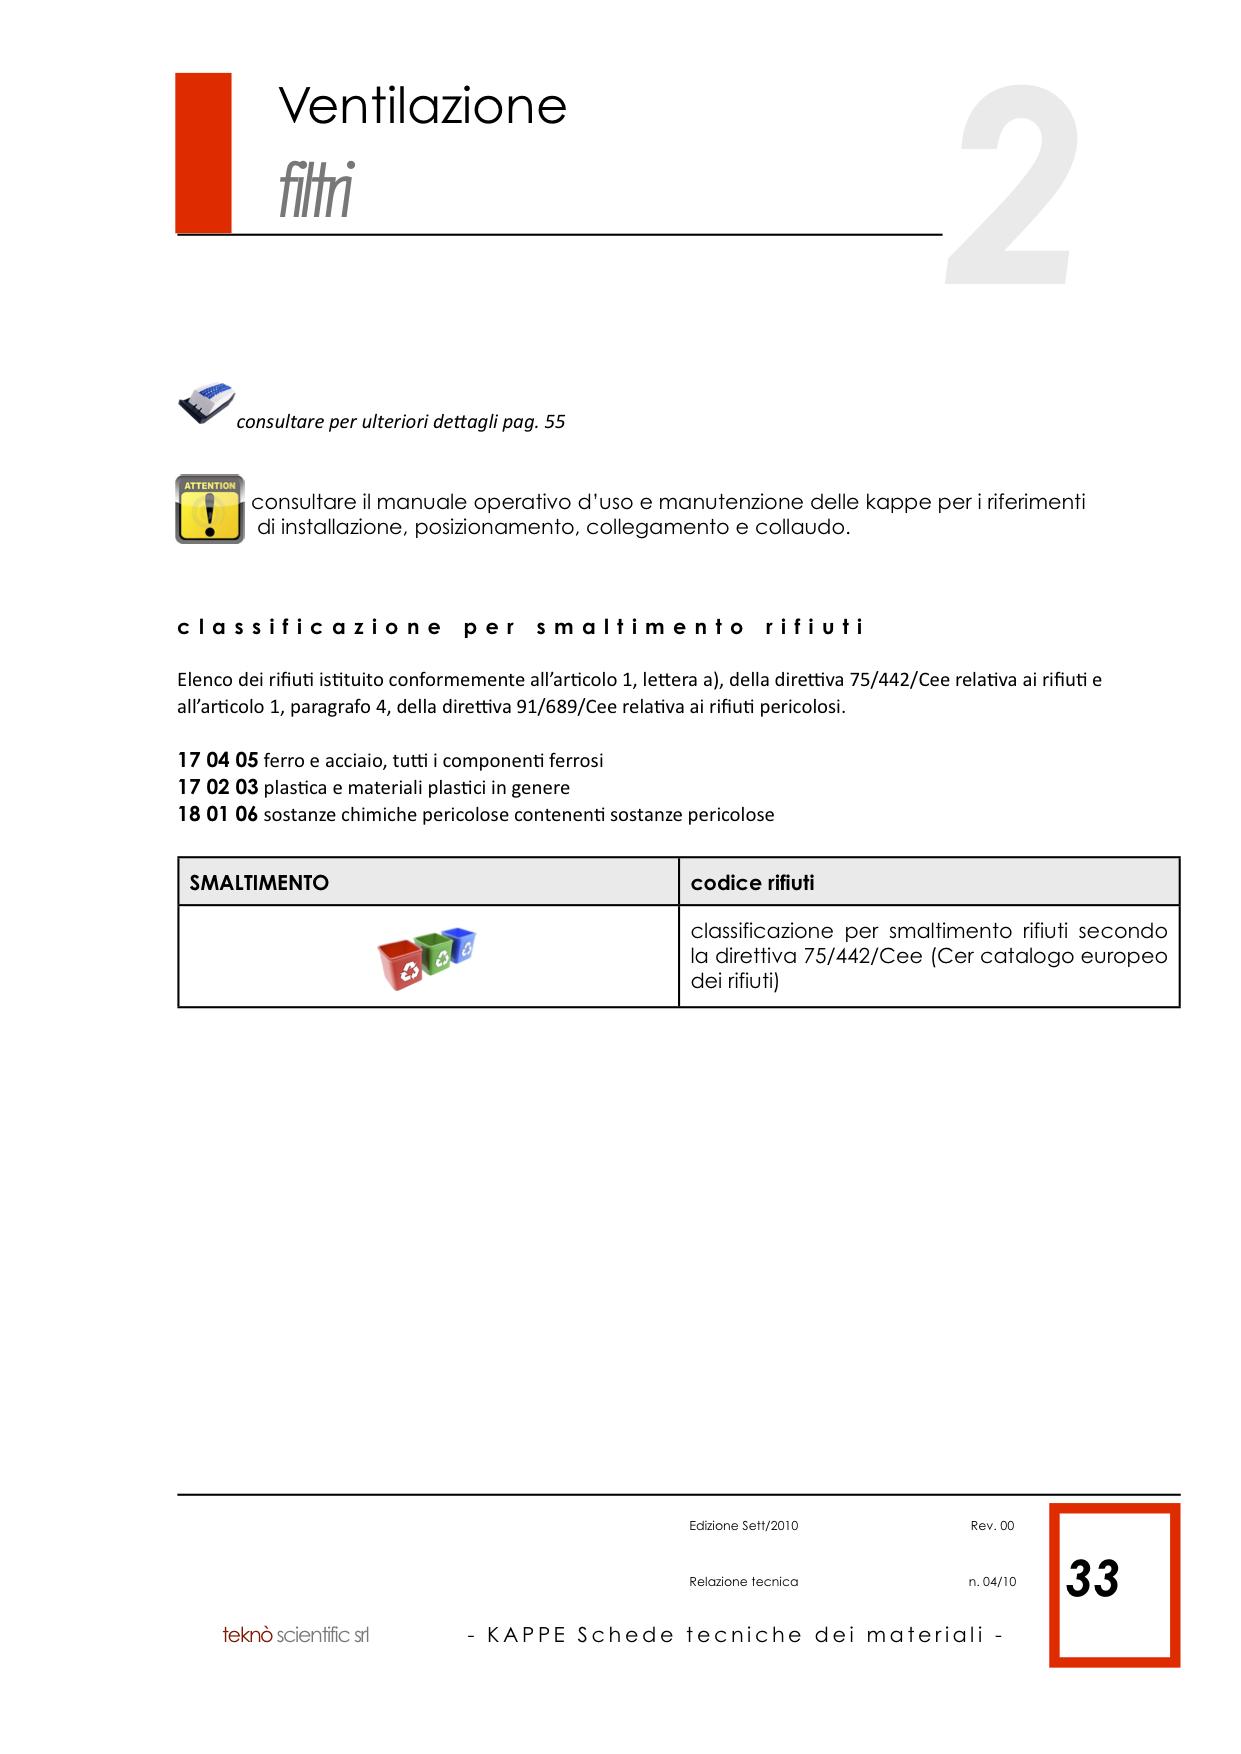 KAPPE Schede tecniche materiali copia 13.png